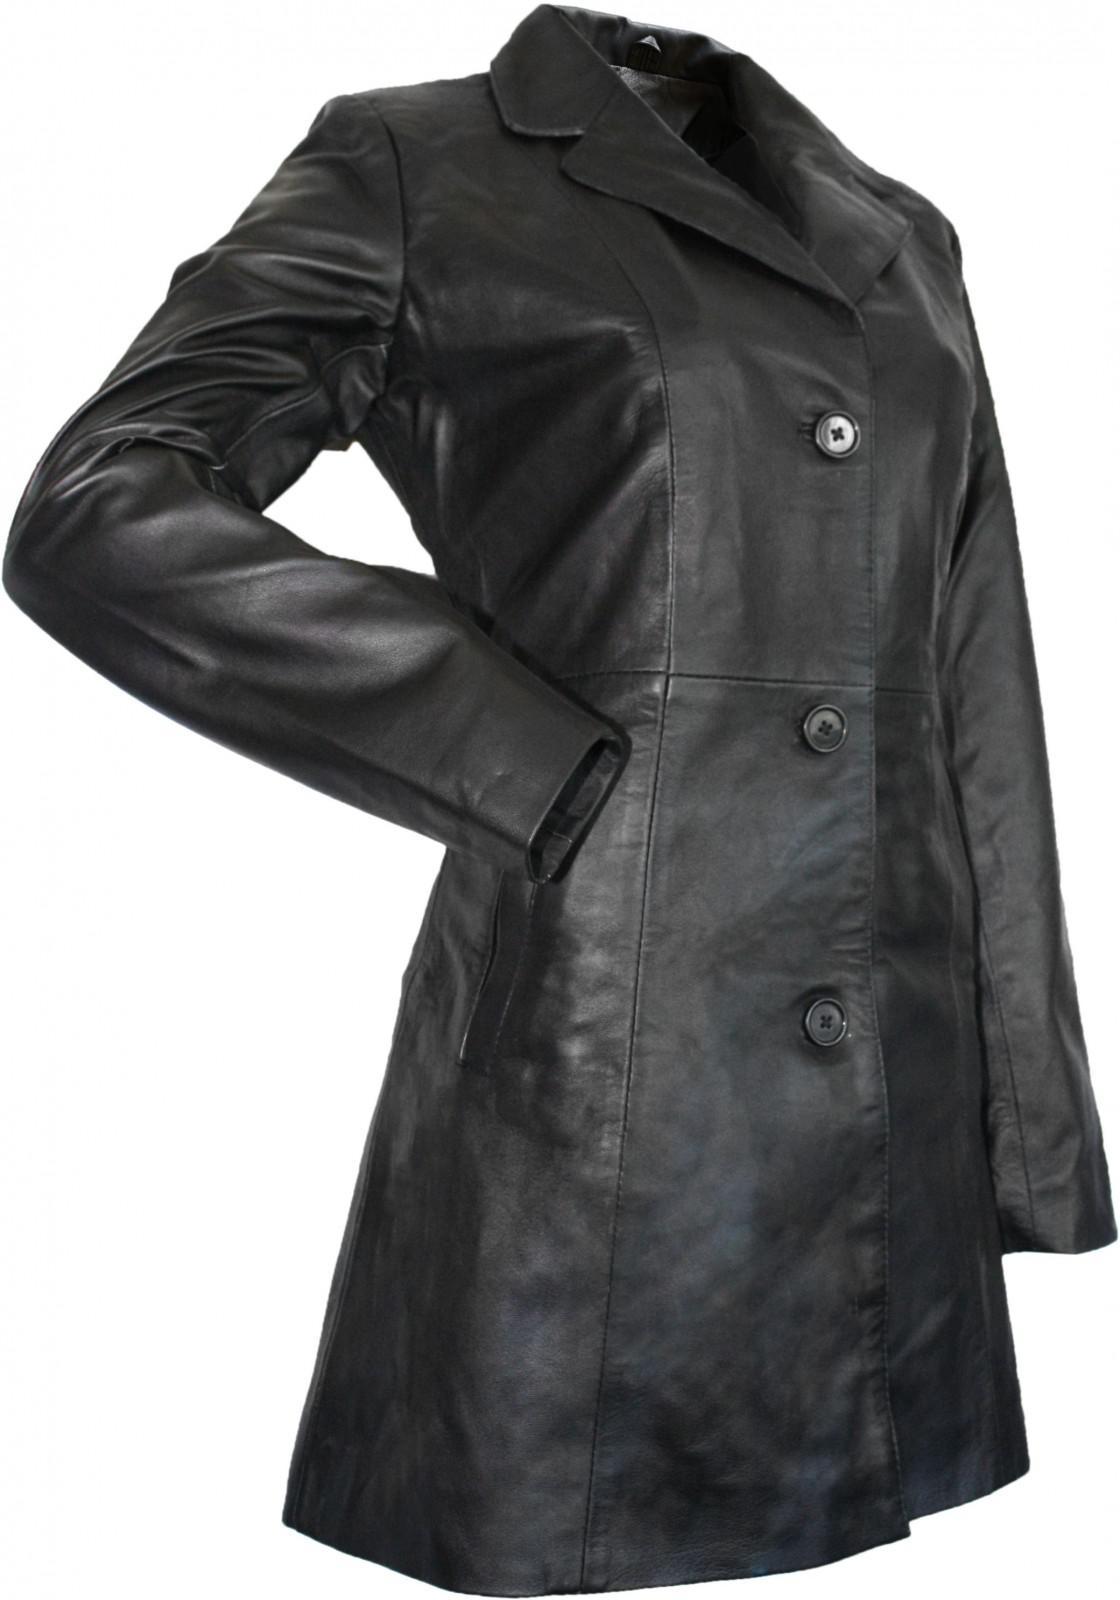 damen ledermantel trenchcoat echtleder mantel aus lammnappa leder schwarz kaufen bei german. Black Bedroom Furniture Sets. Home Design Ideas